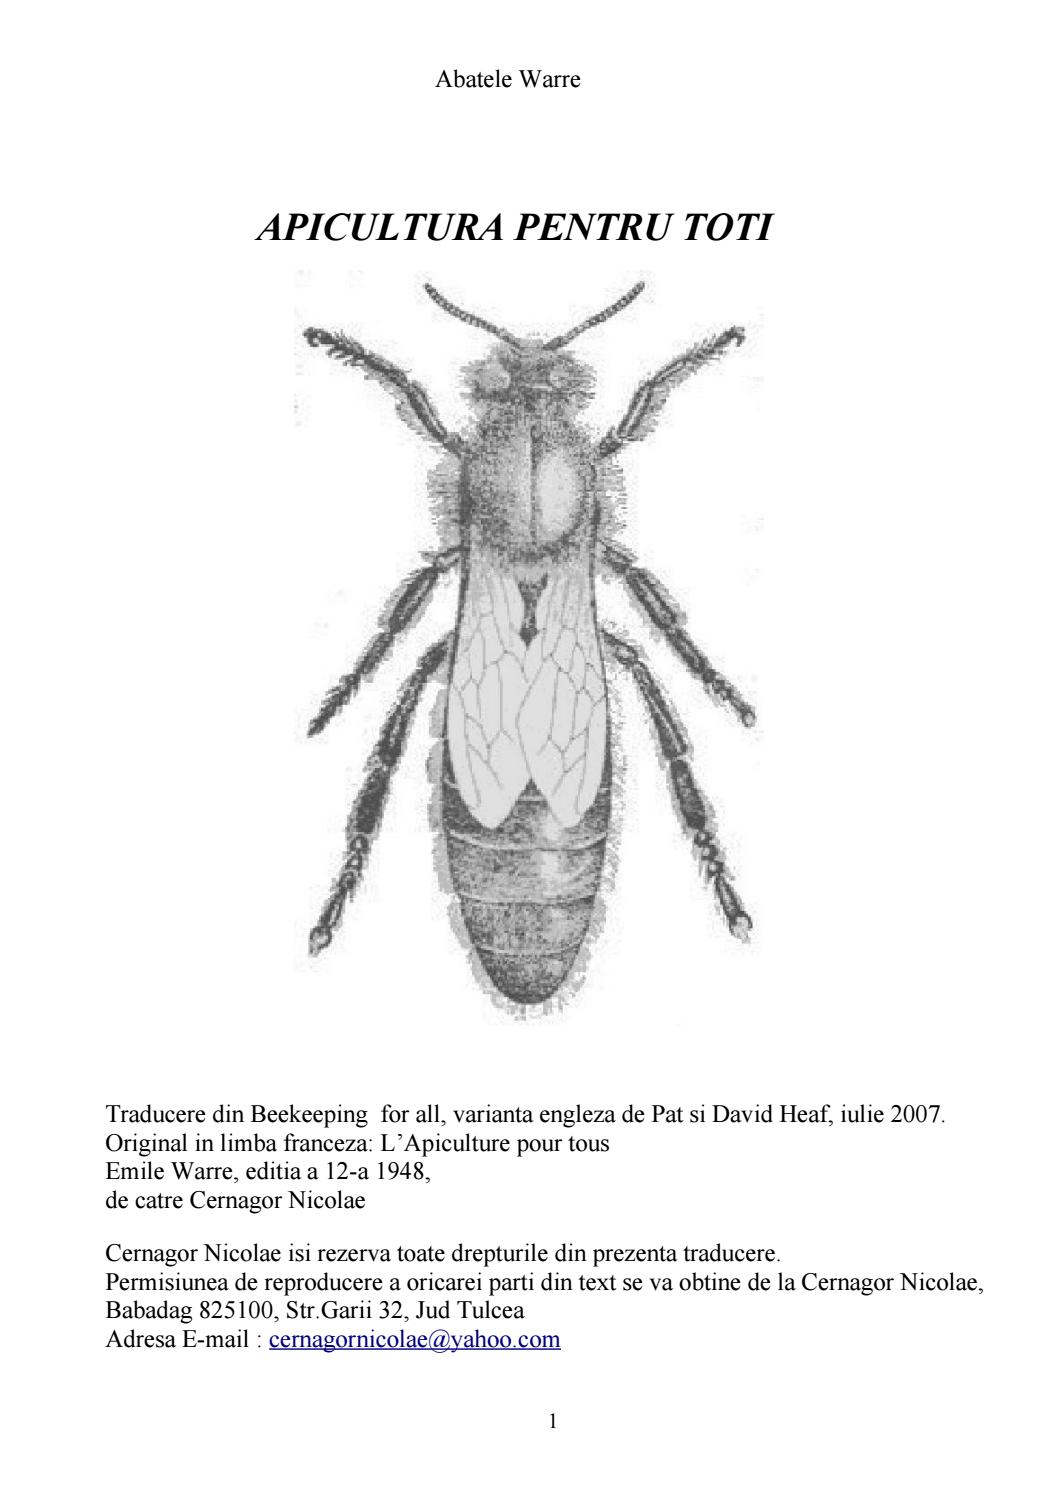 Jalaponii omoară paraziții, Histopathology of confluent and reticulated papillomatosis